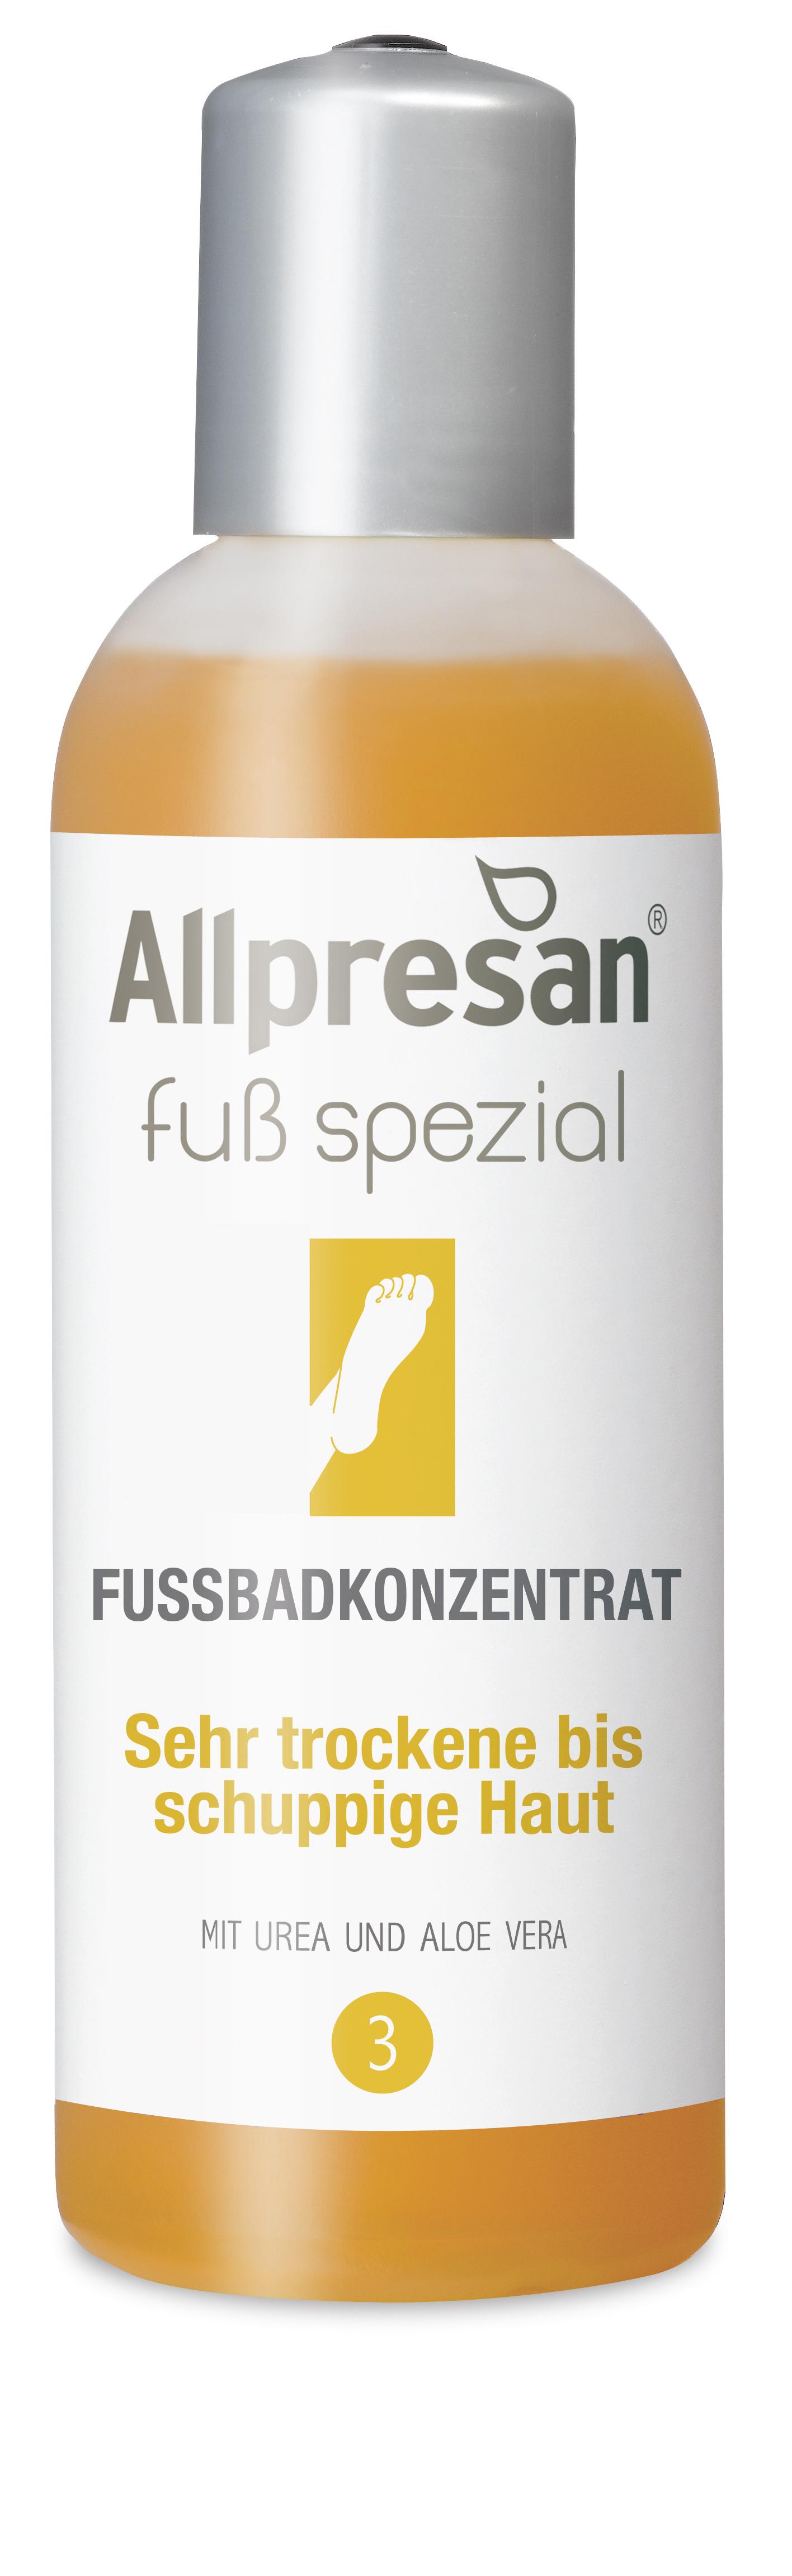 Allpresan Fuß spezial Fußbad-Konzentrat, 150 ml